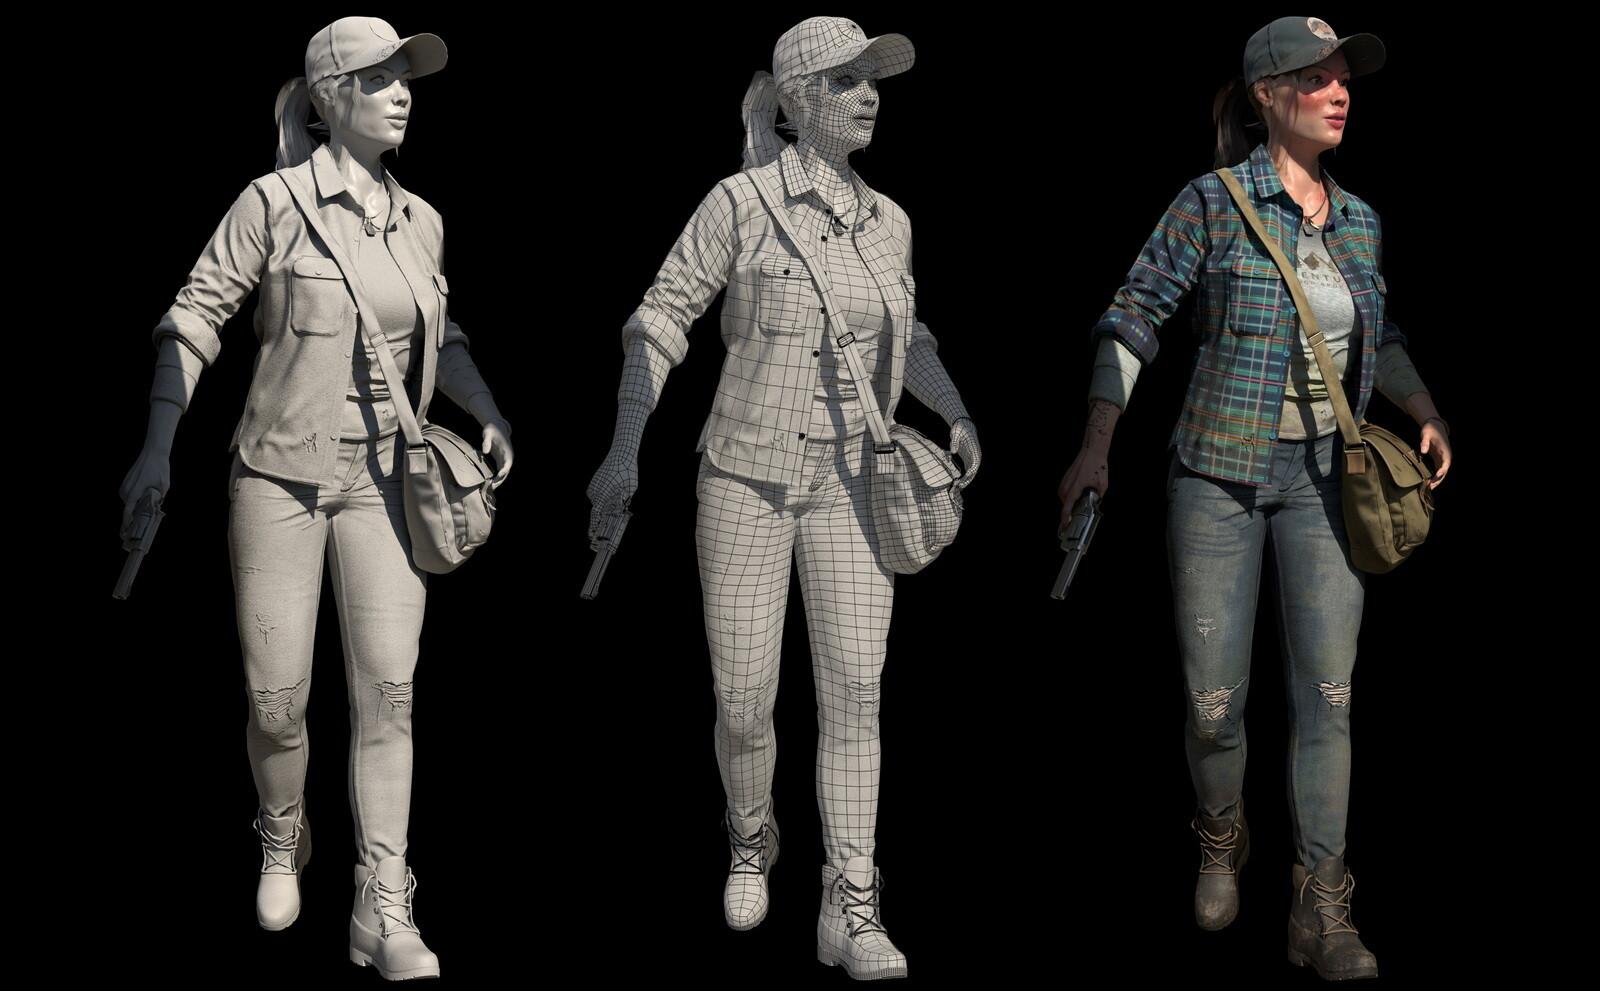 Michal klimecki michal klimecki 3d artist character modeling 10